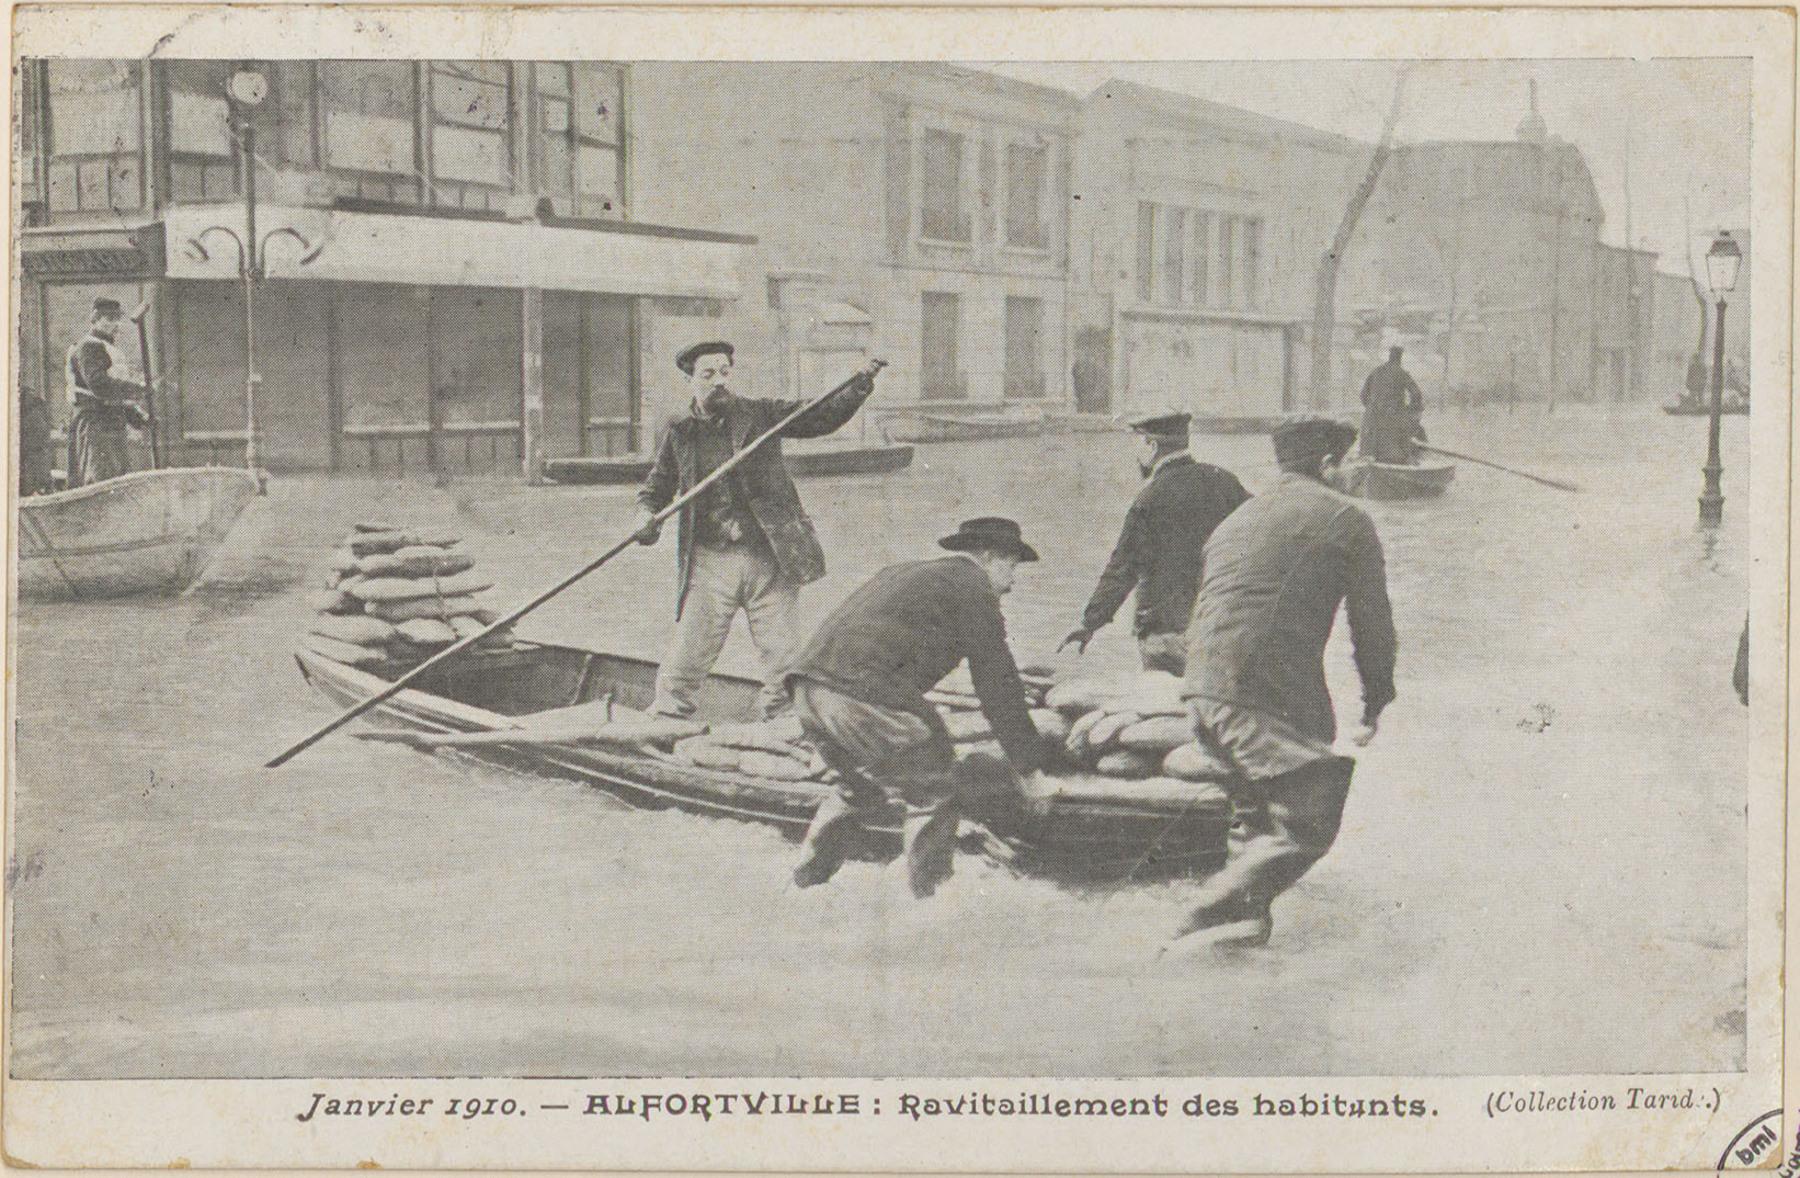 Contenu du Janvier 1910, Alfortville: Ravitaillement des habitants